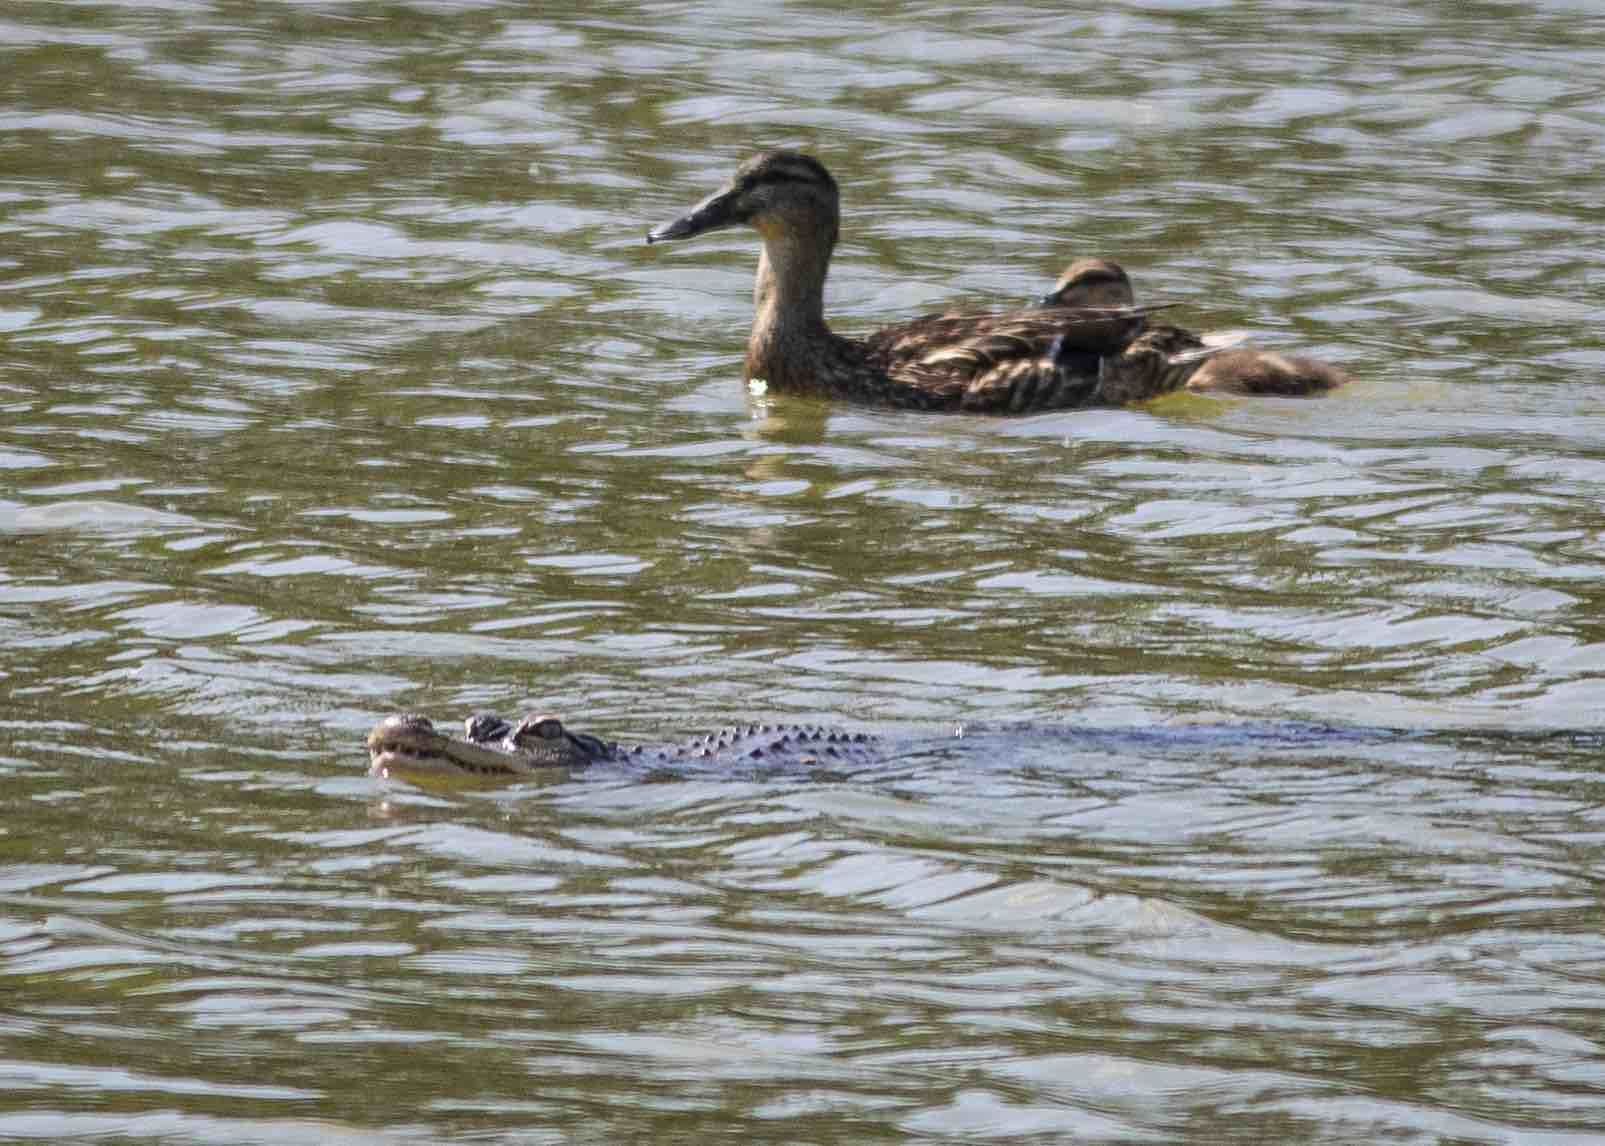 Alligator swimming in Humboldt Park Lagoon.